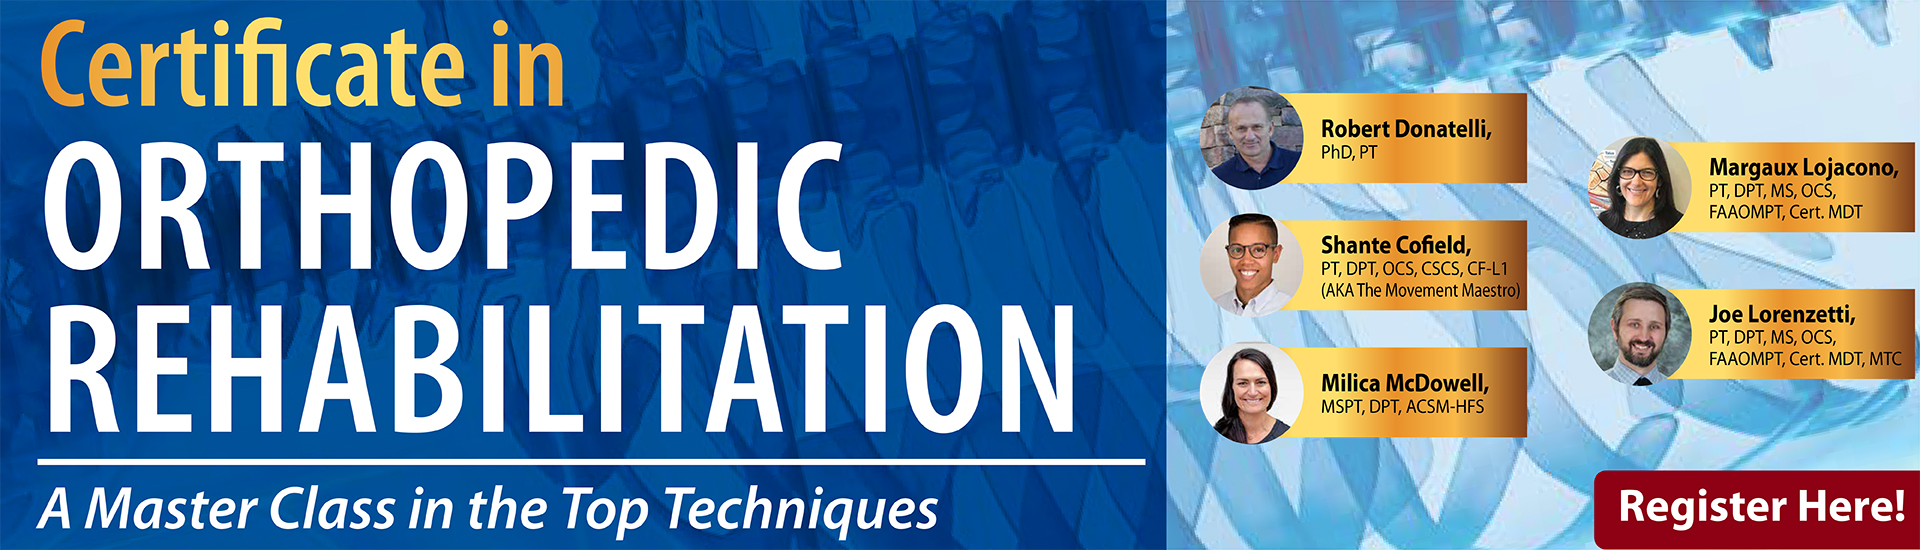 Certificate in Orthopedic Rehabilitation